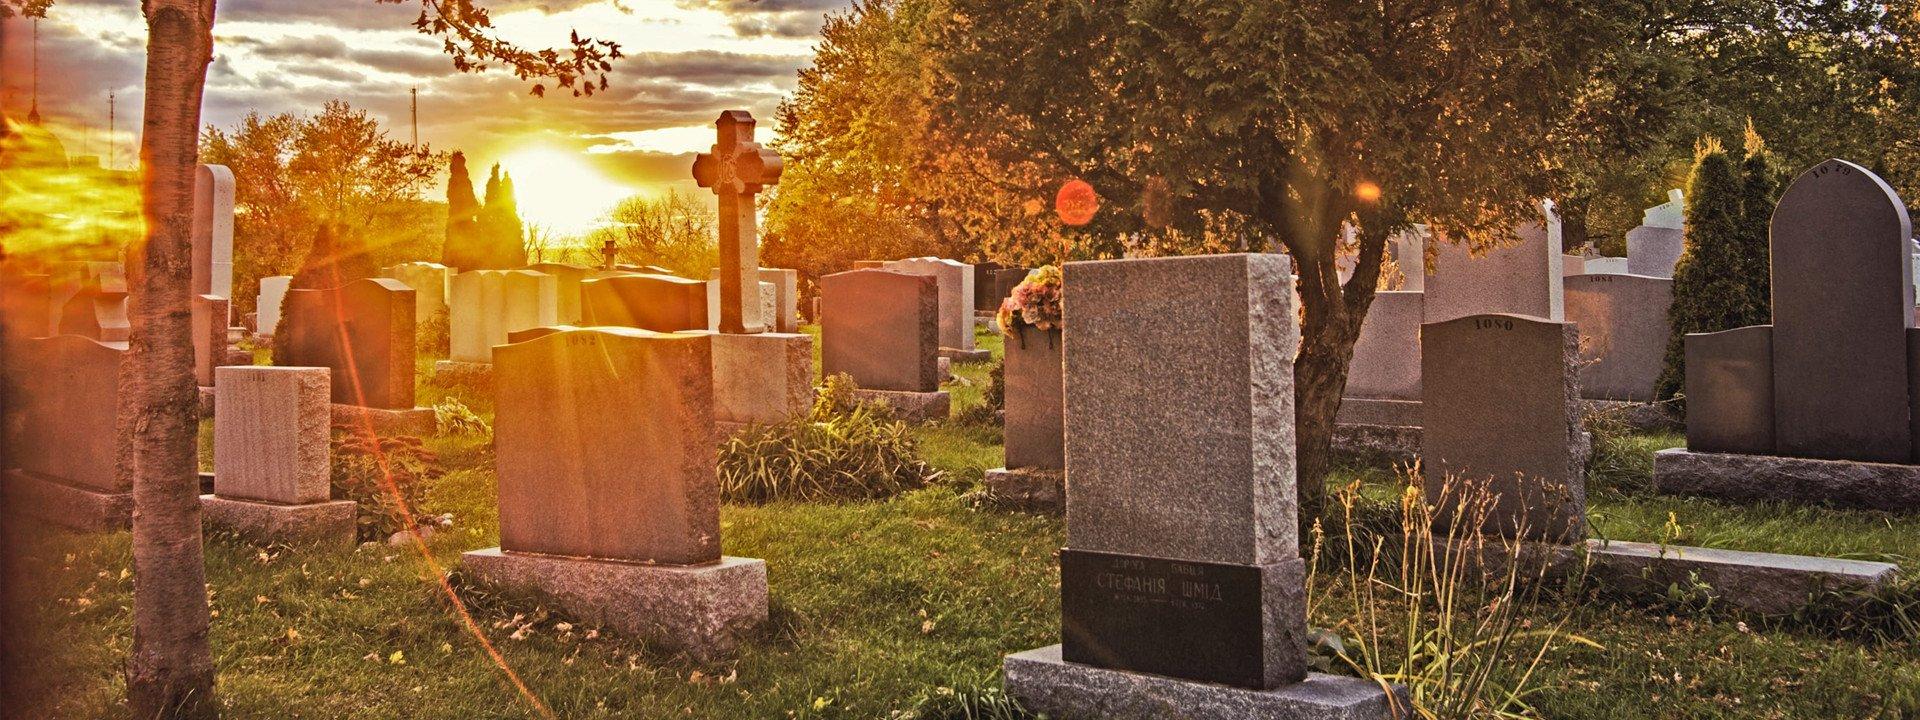 Services | Kincannon Funeral Home